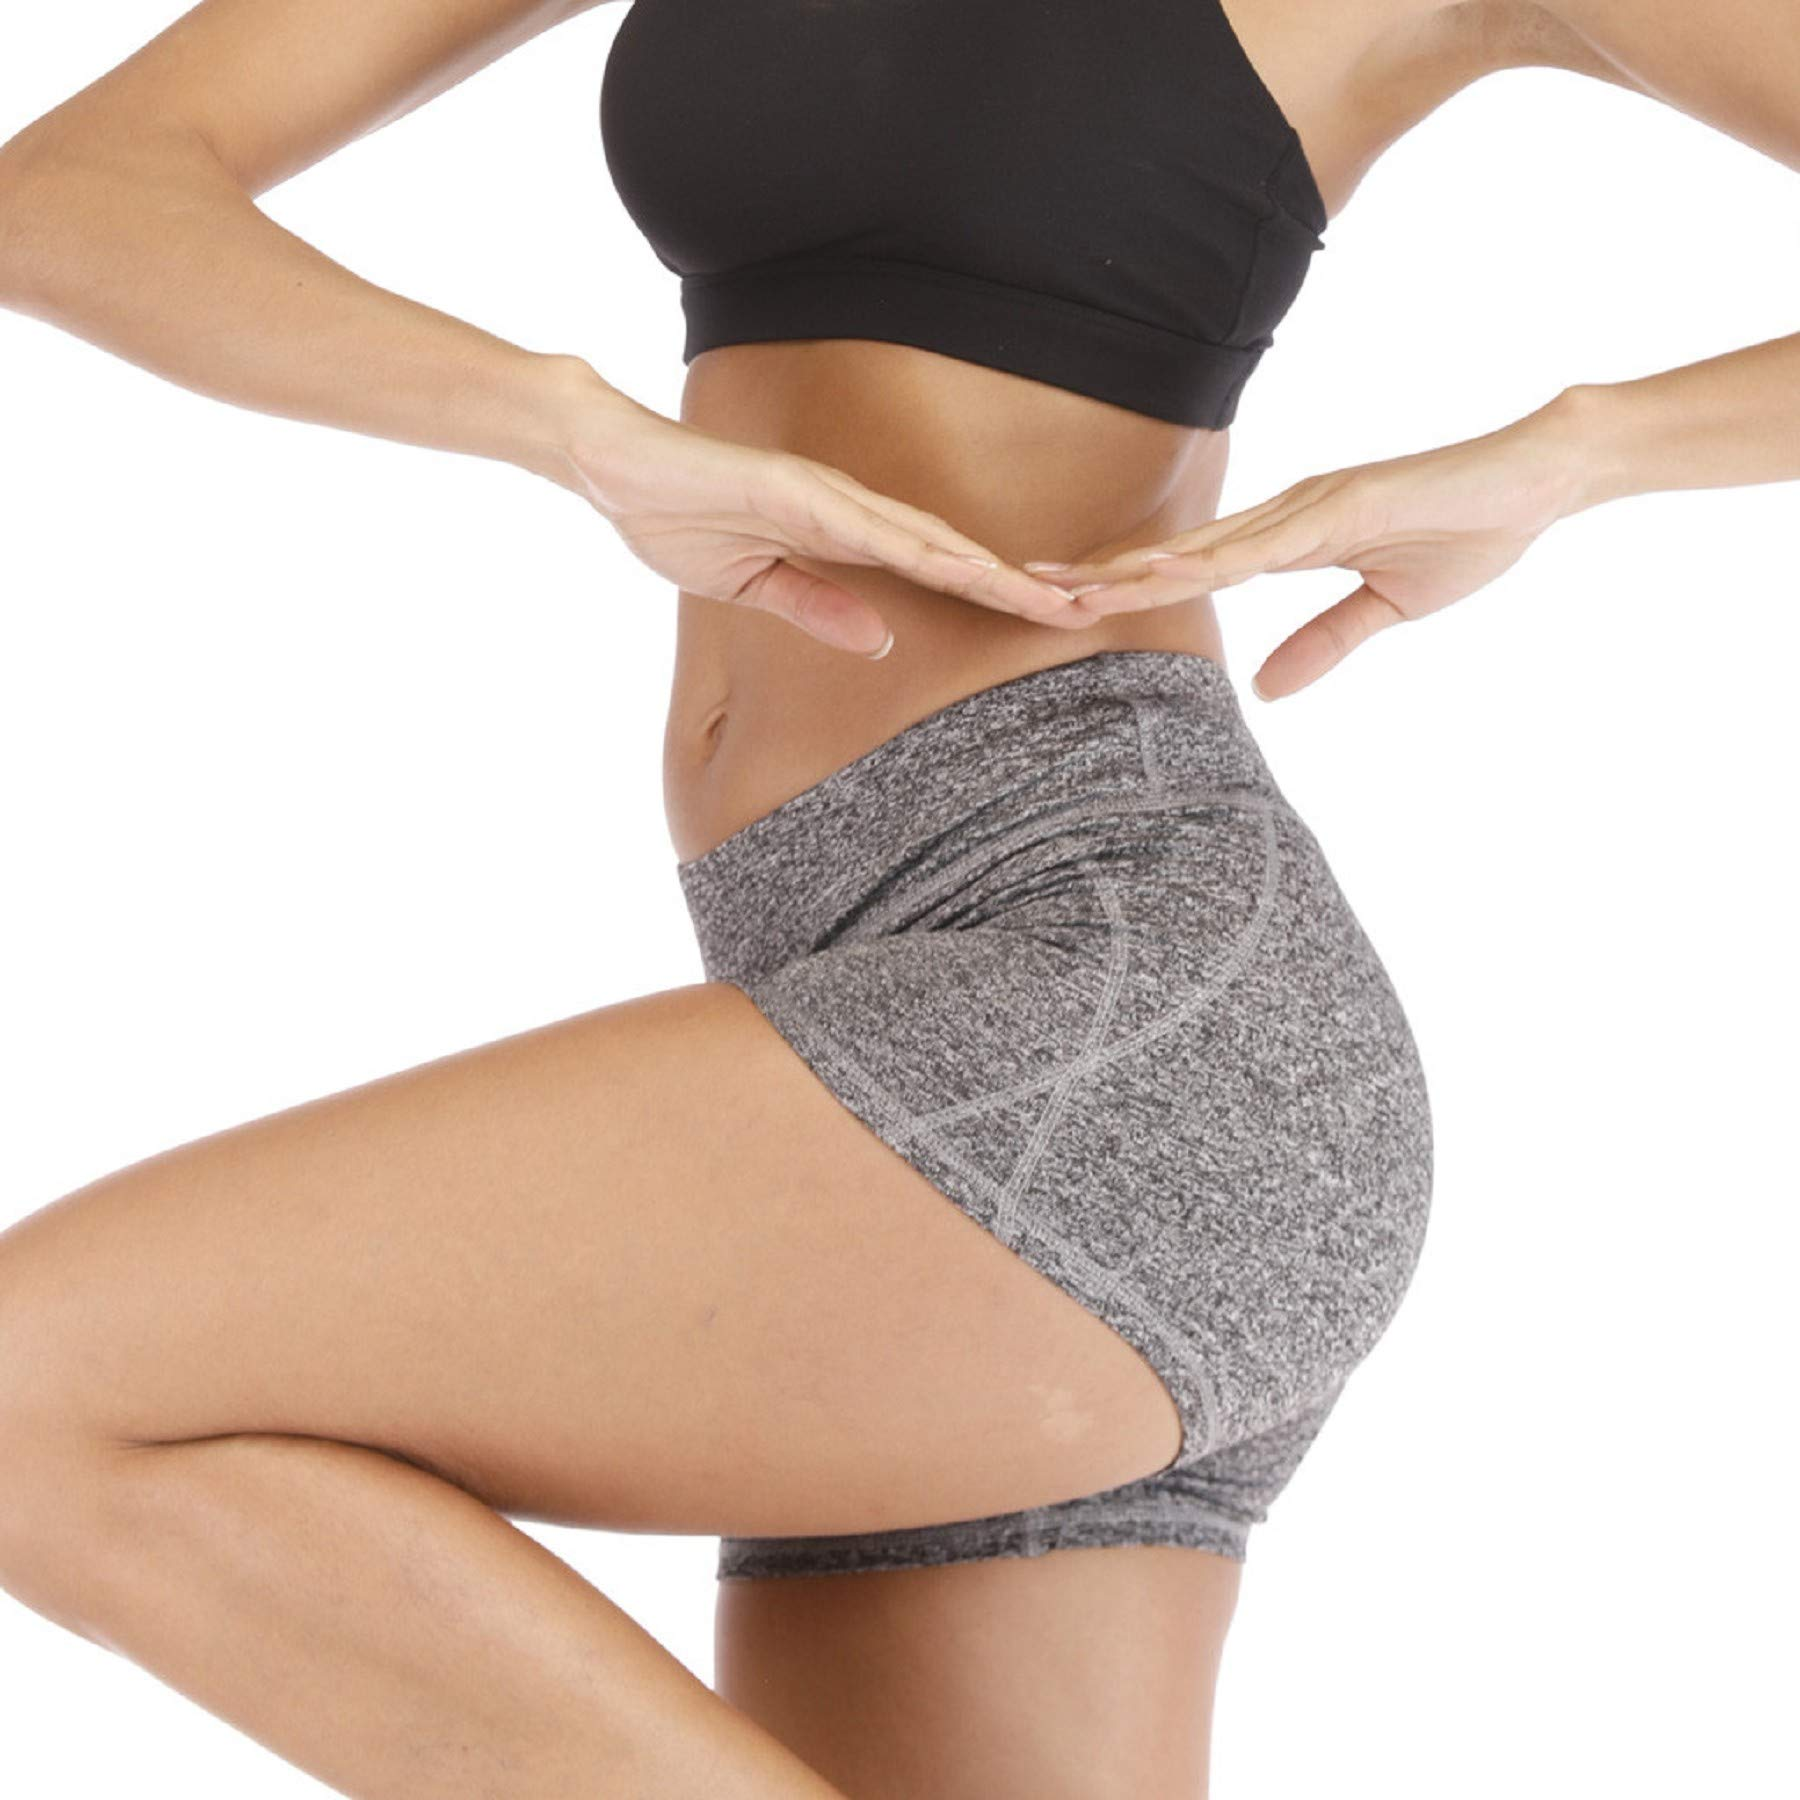 Women's Butt Lift Stretch High Waist Short Yoga Leggings Gym Tummy Control Workout Pants Activewear Skinny Tights Gray